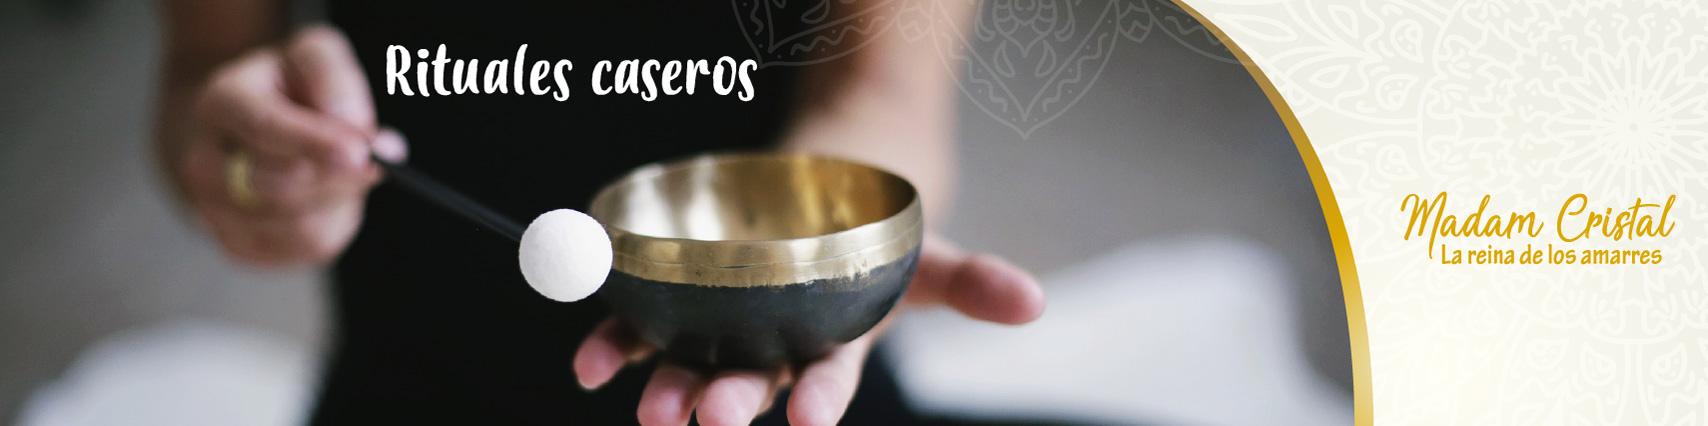 rituales-caseros-por-madam-cristal